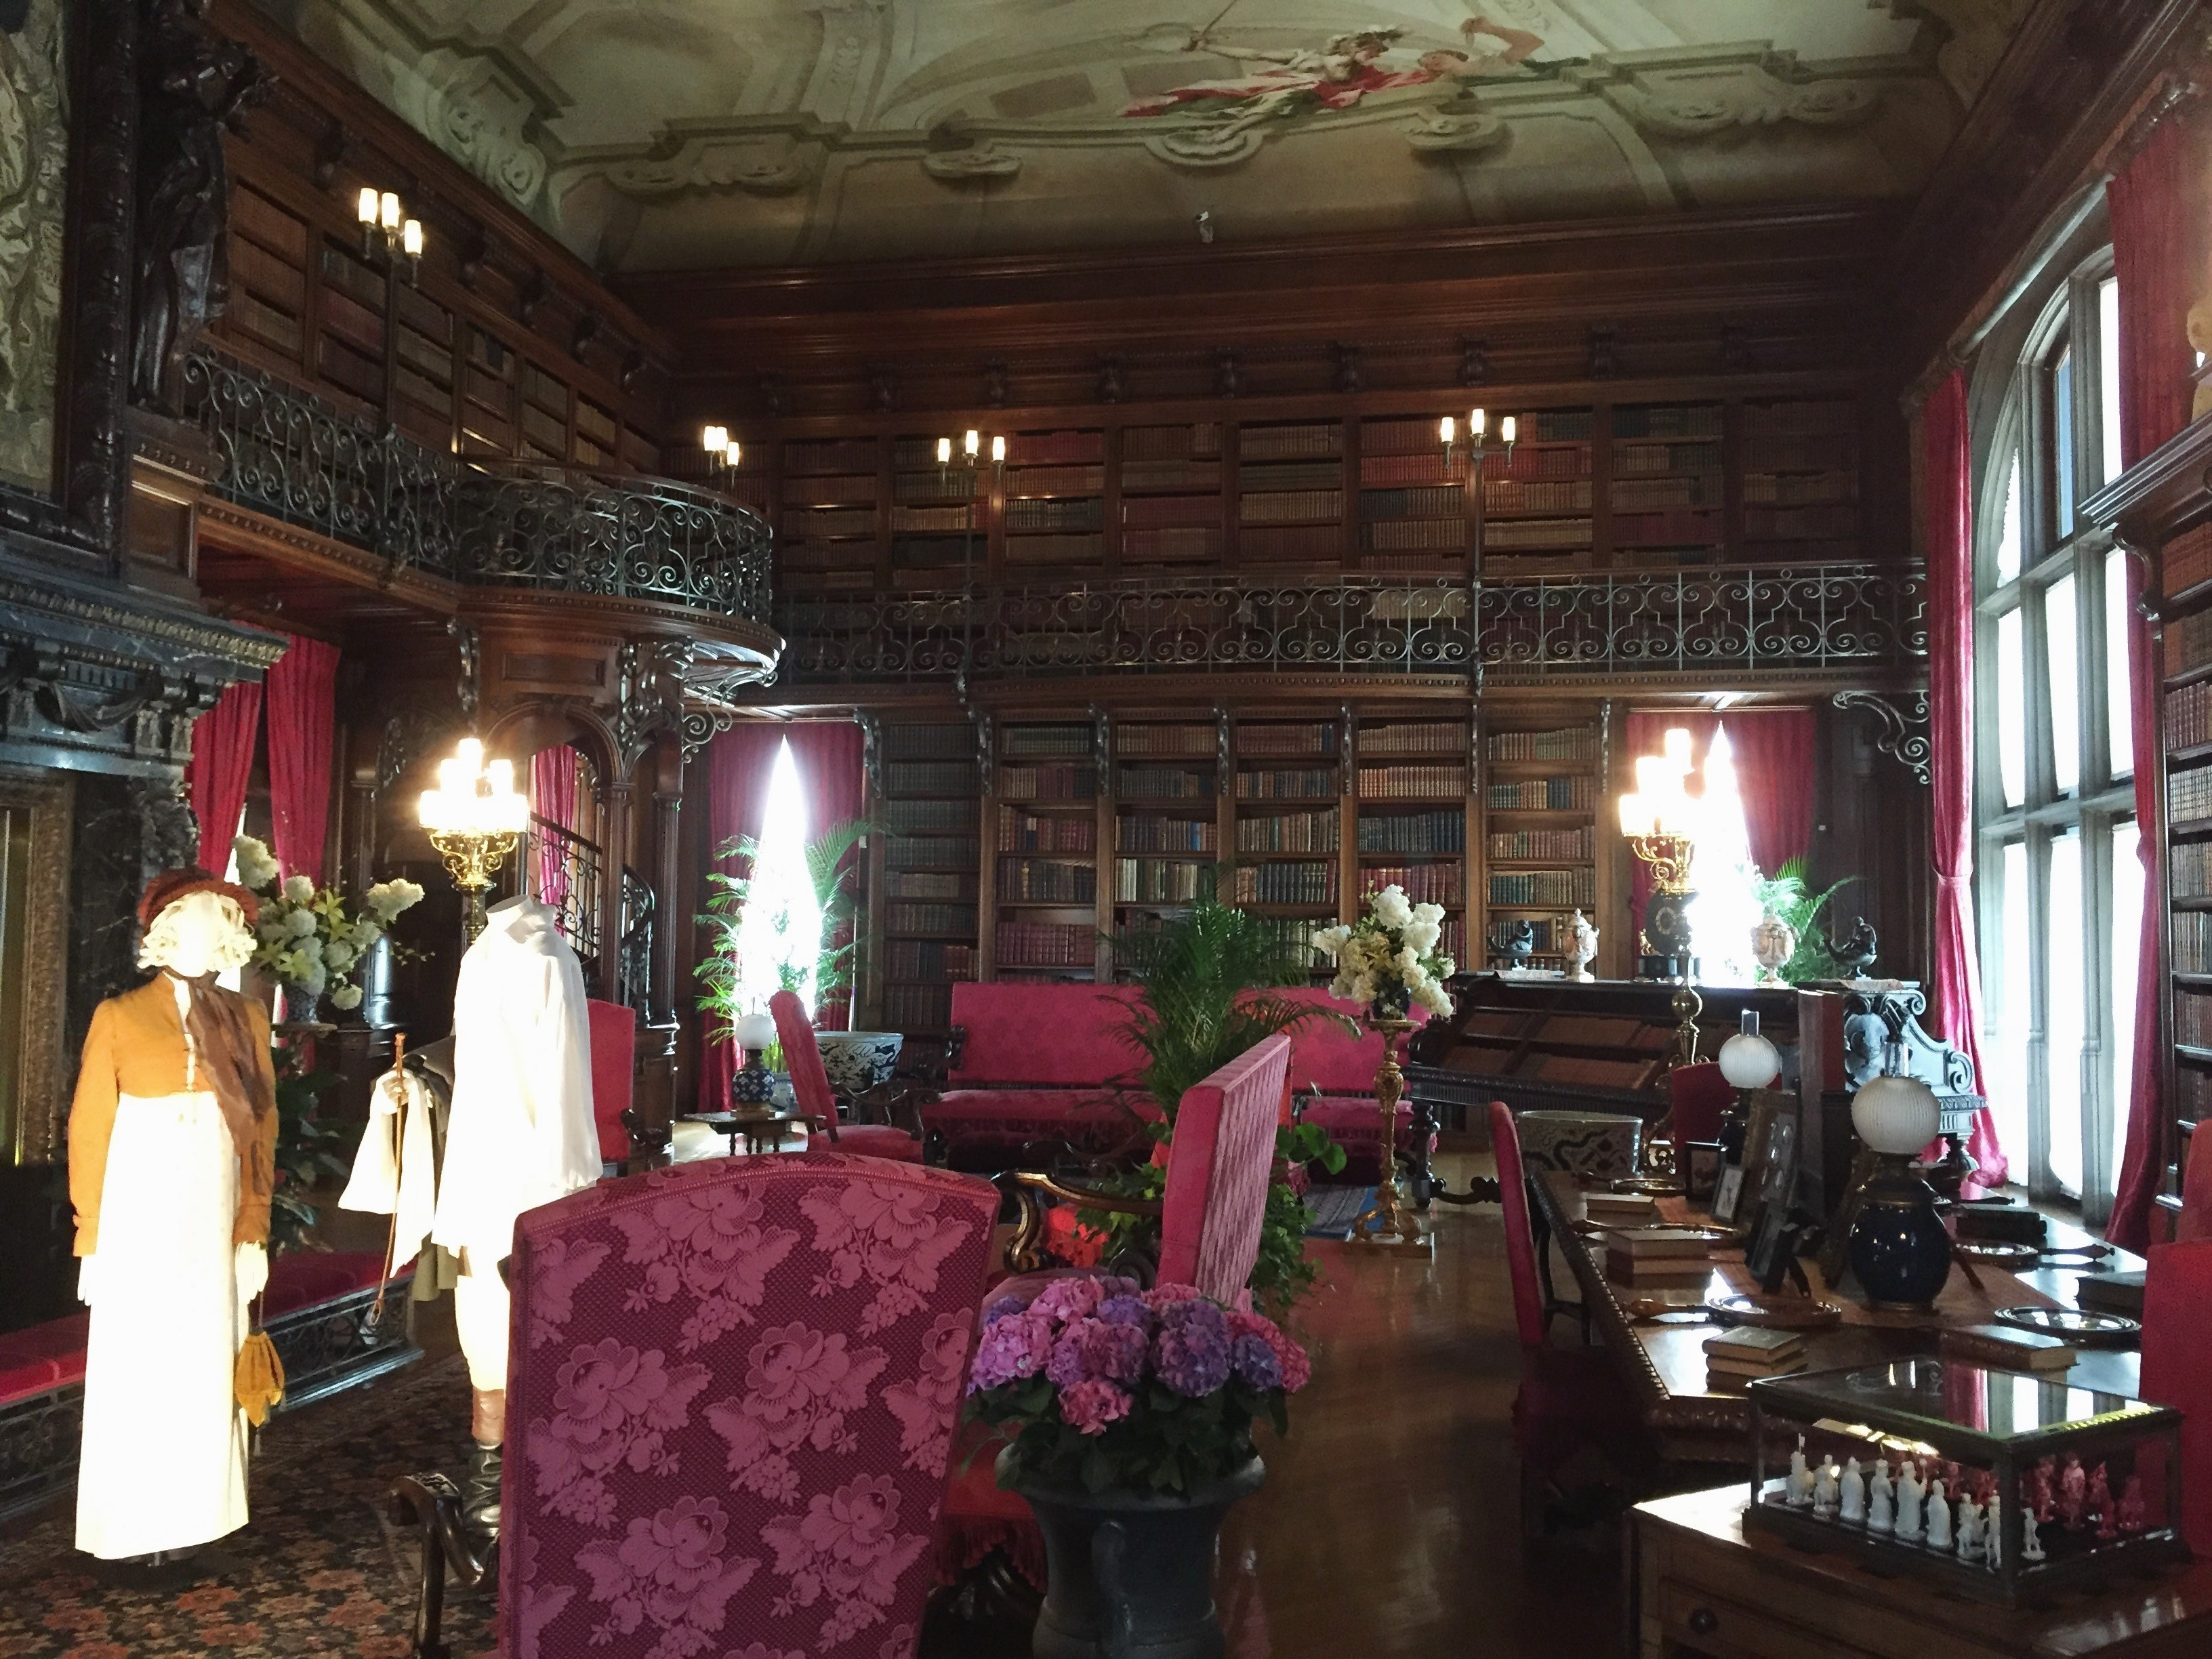 The Biltmore Estate - Biltmore House Library